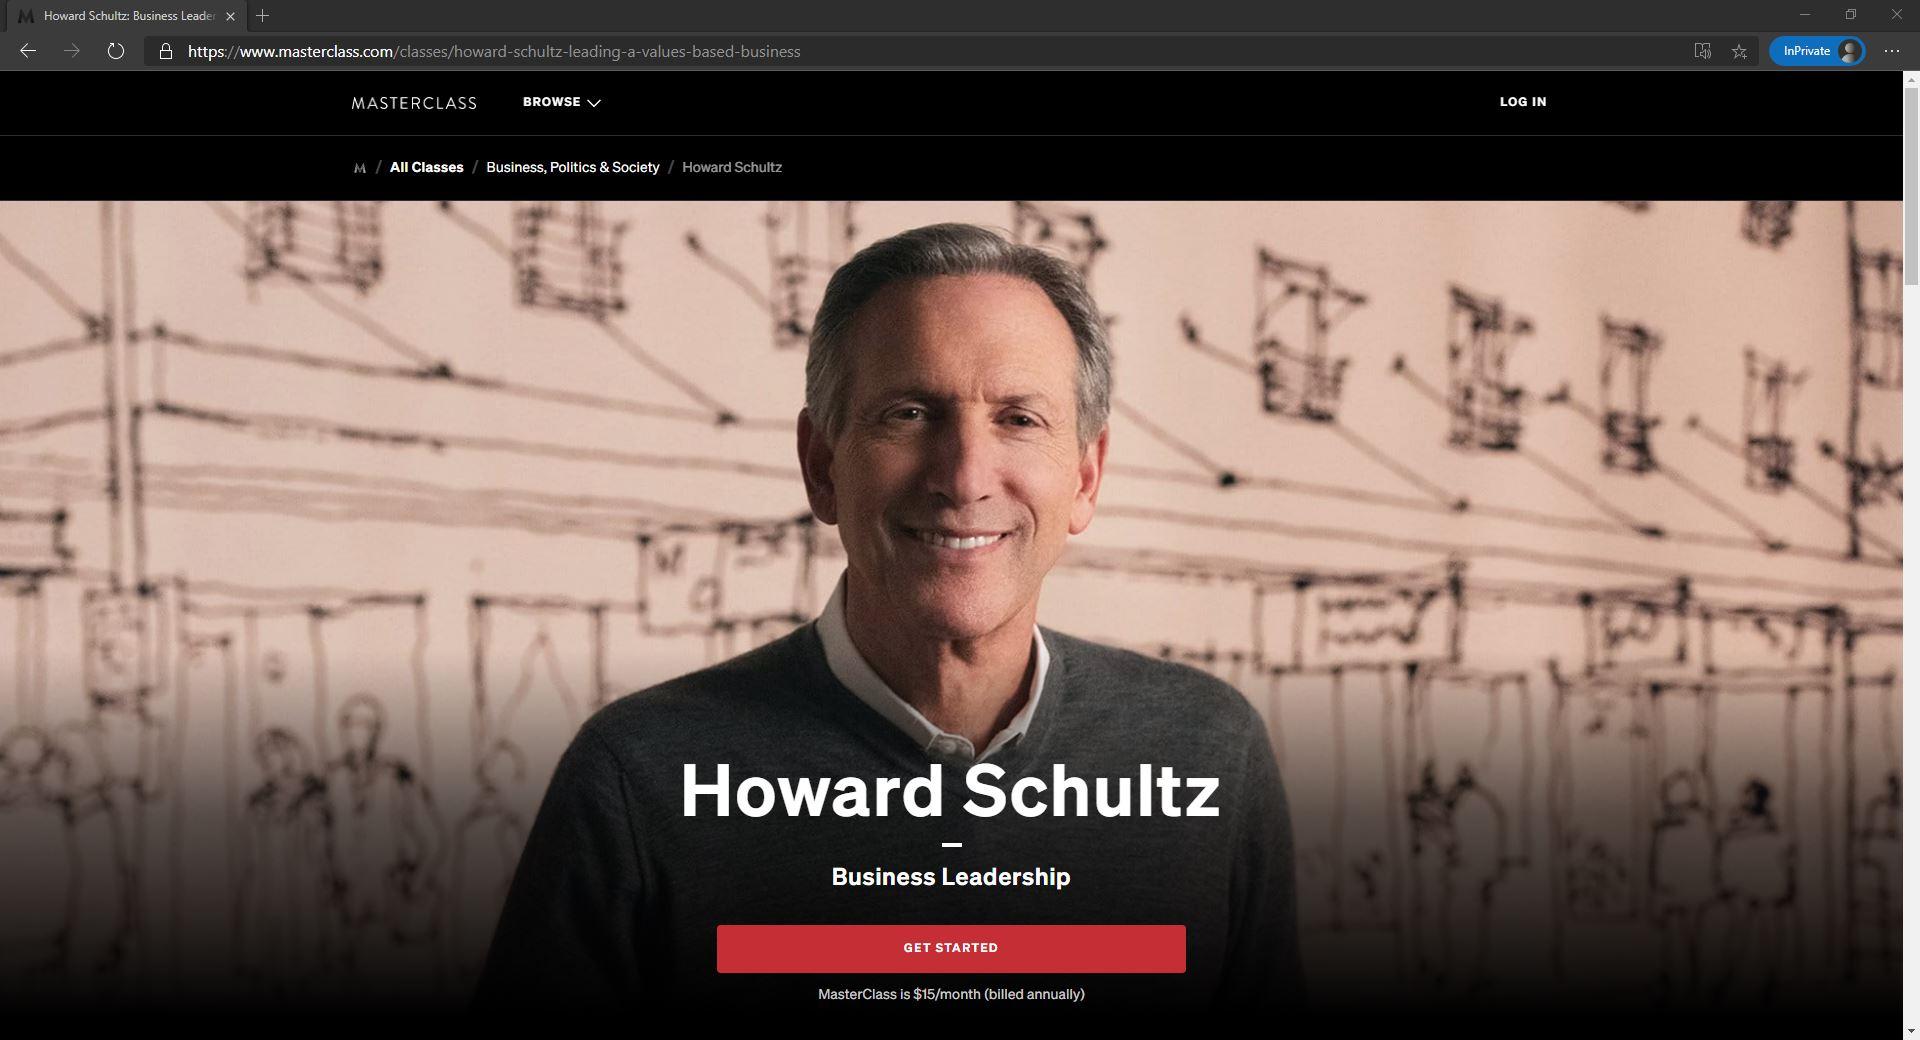 Howard Schultz on Masterclass